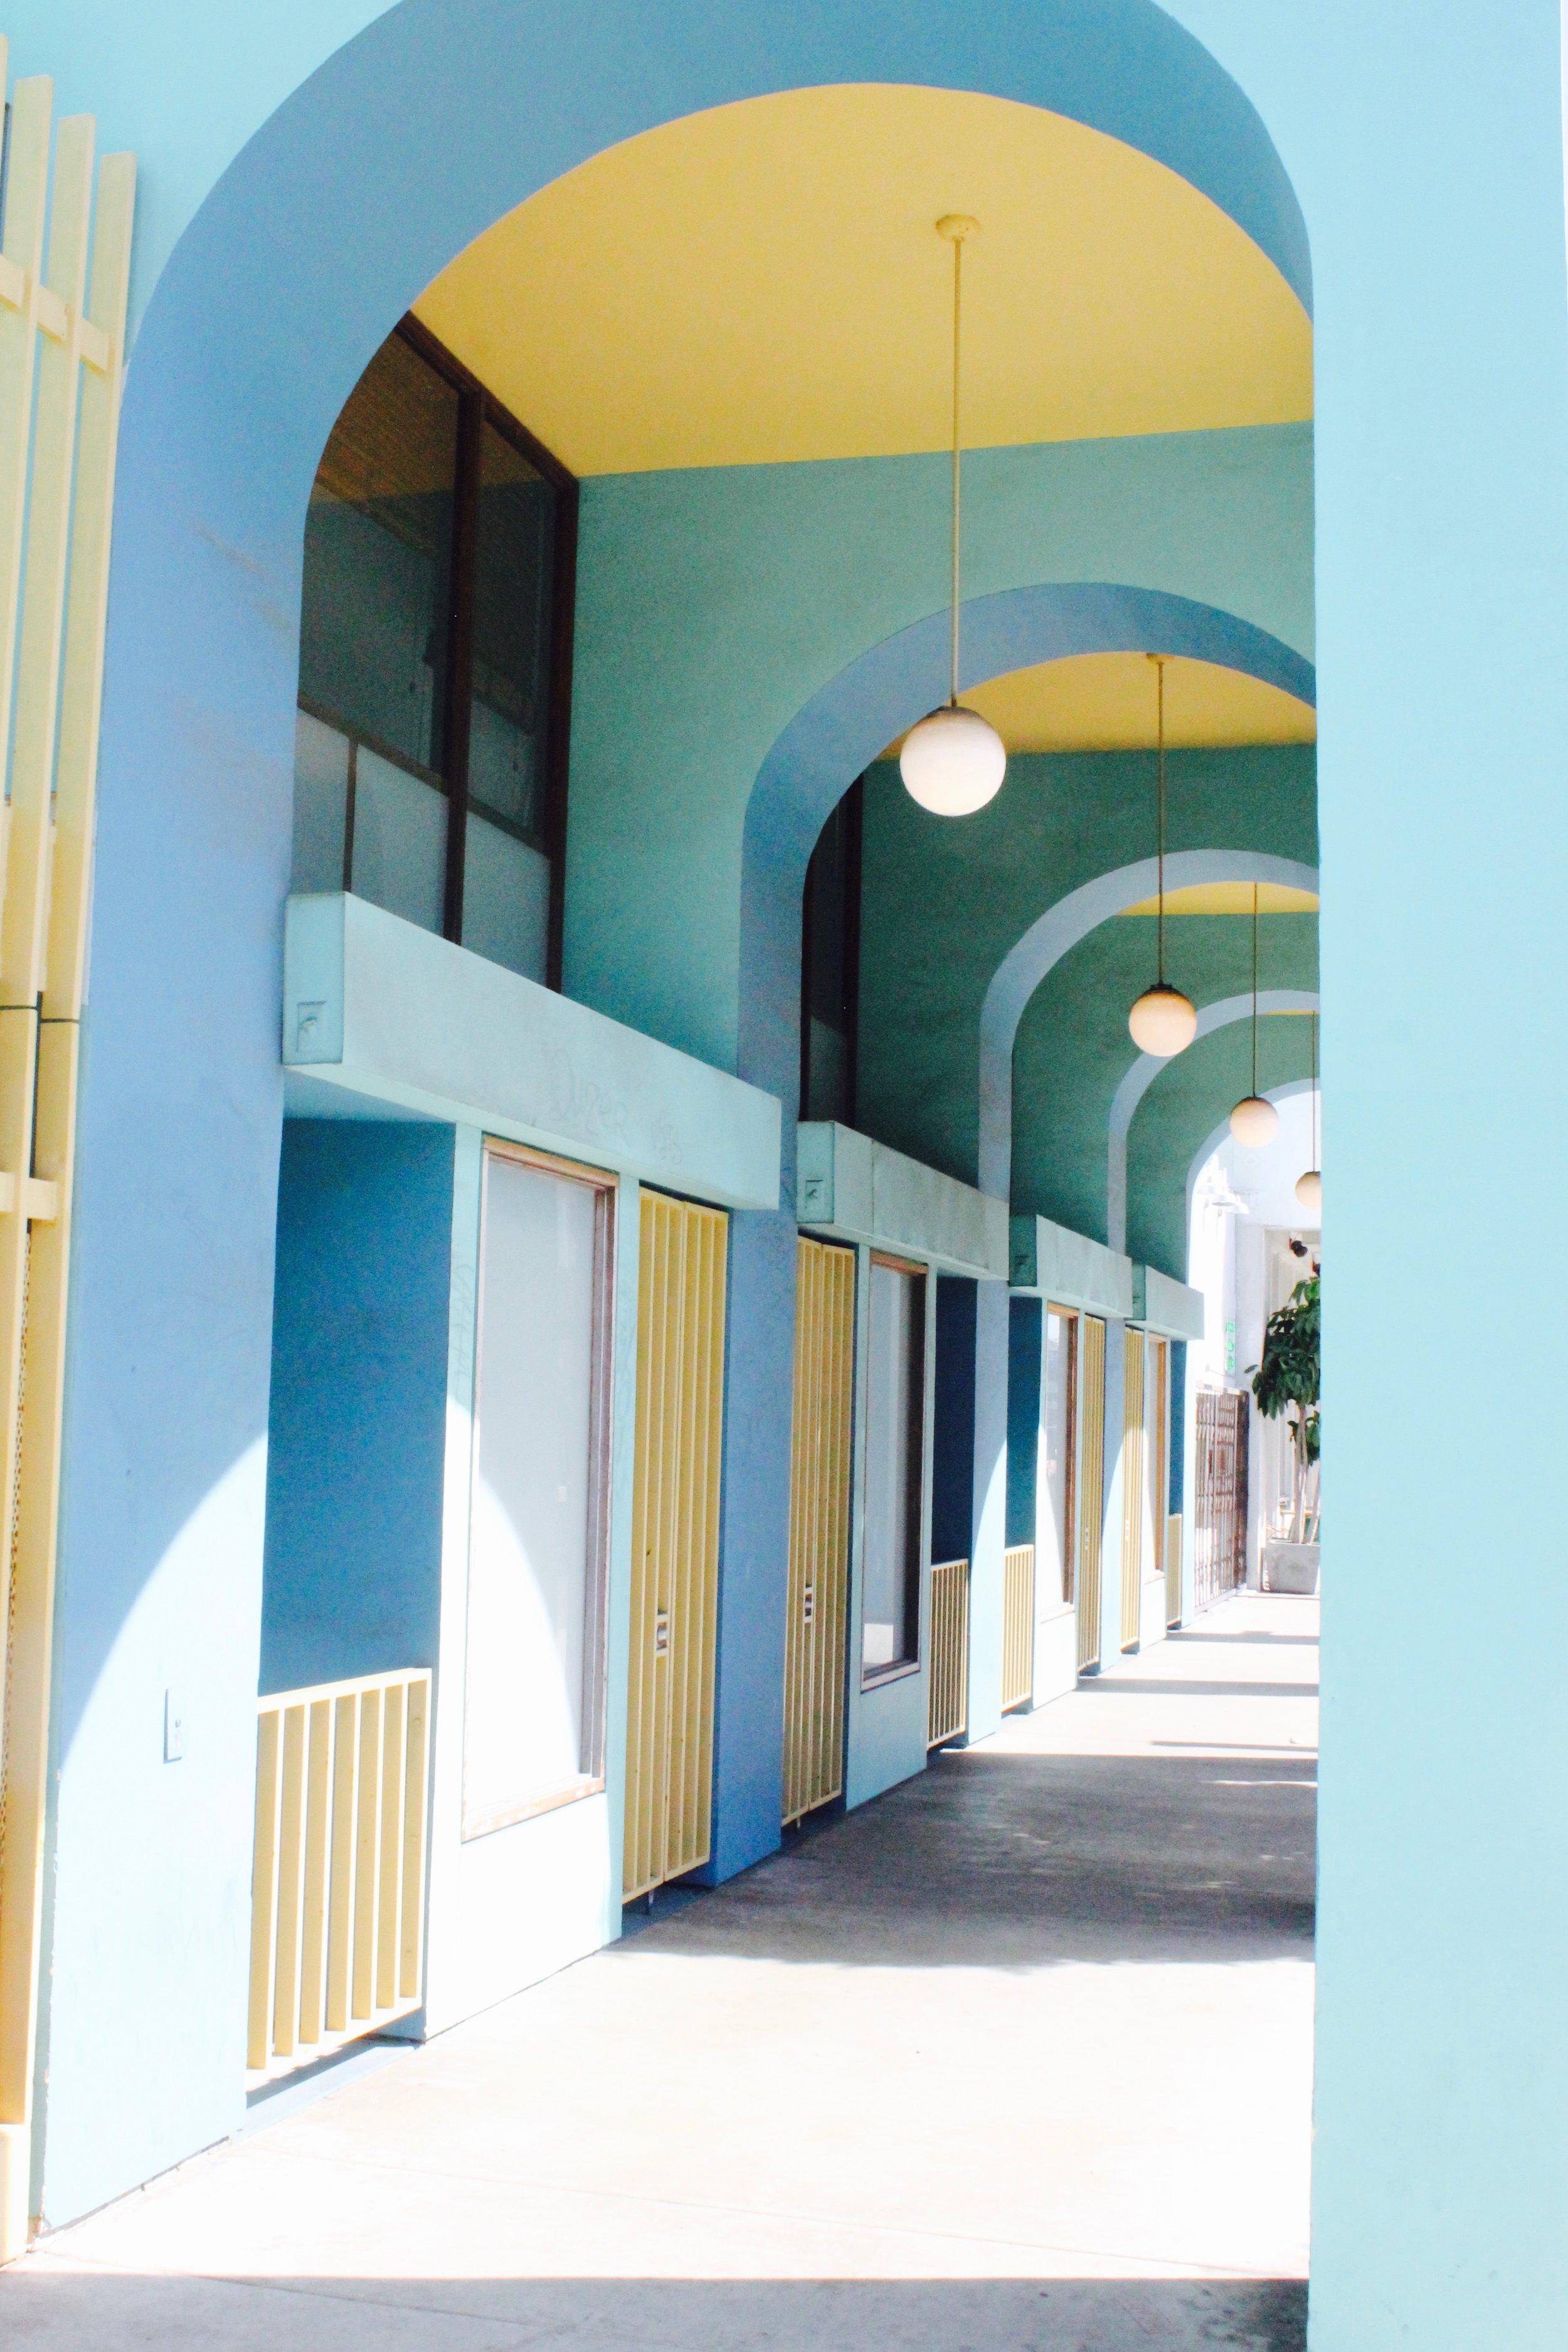 Building aesthetics at Venice Beach